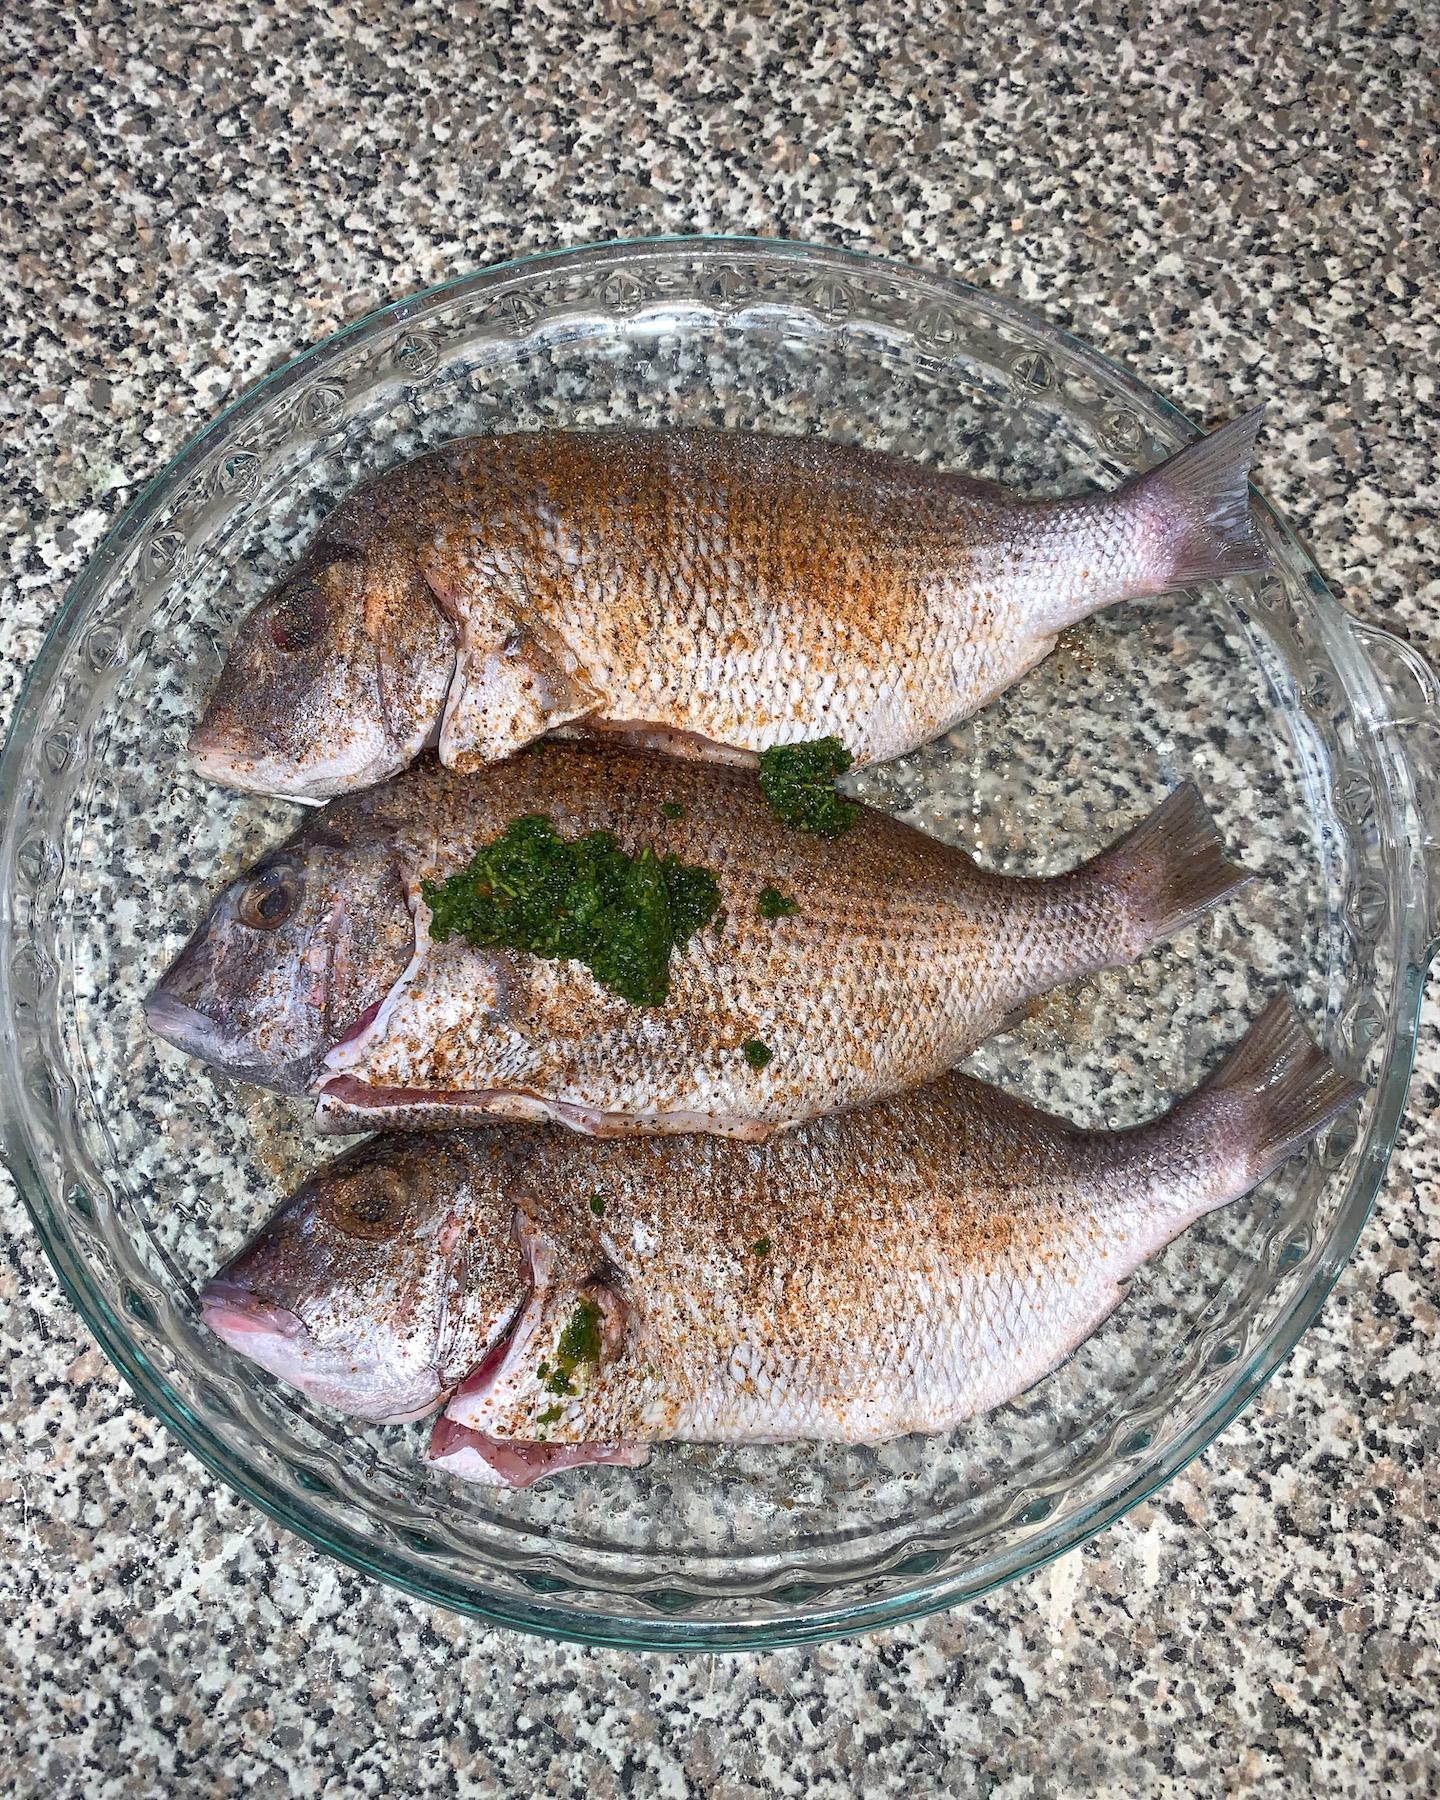 How To Season Porgie Fish